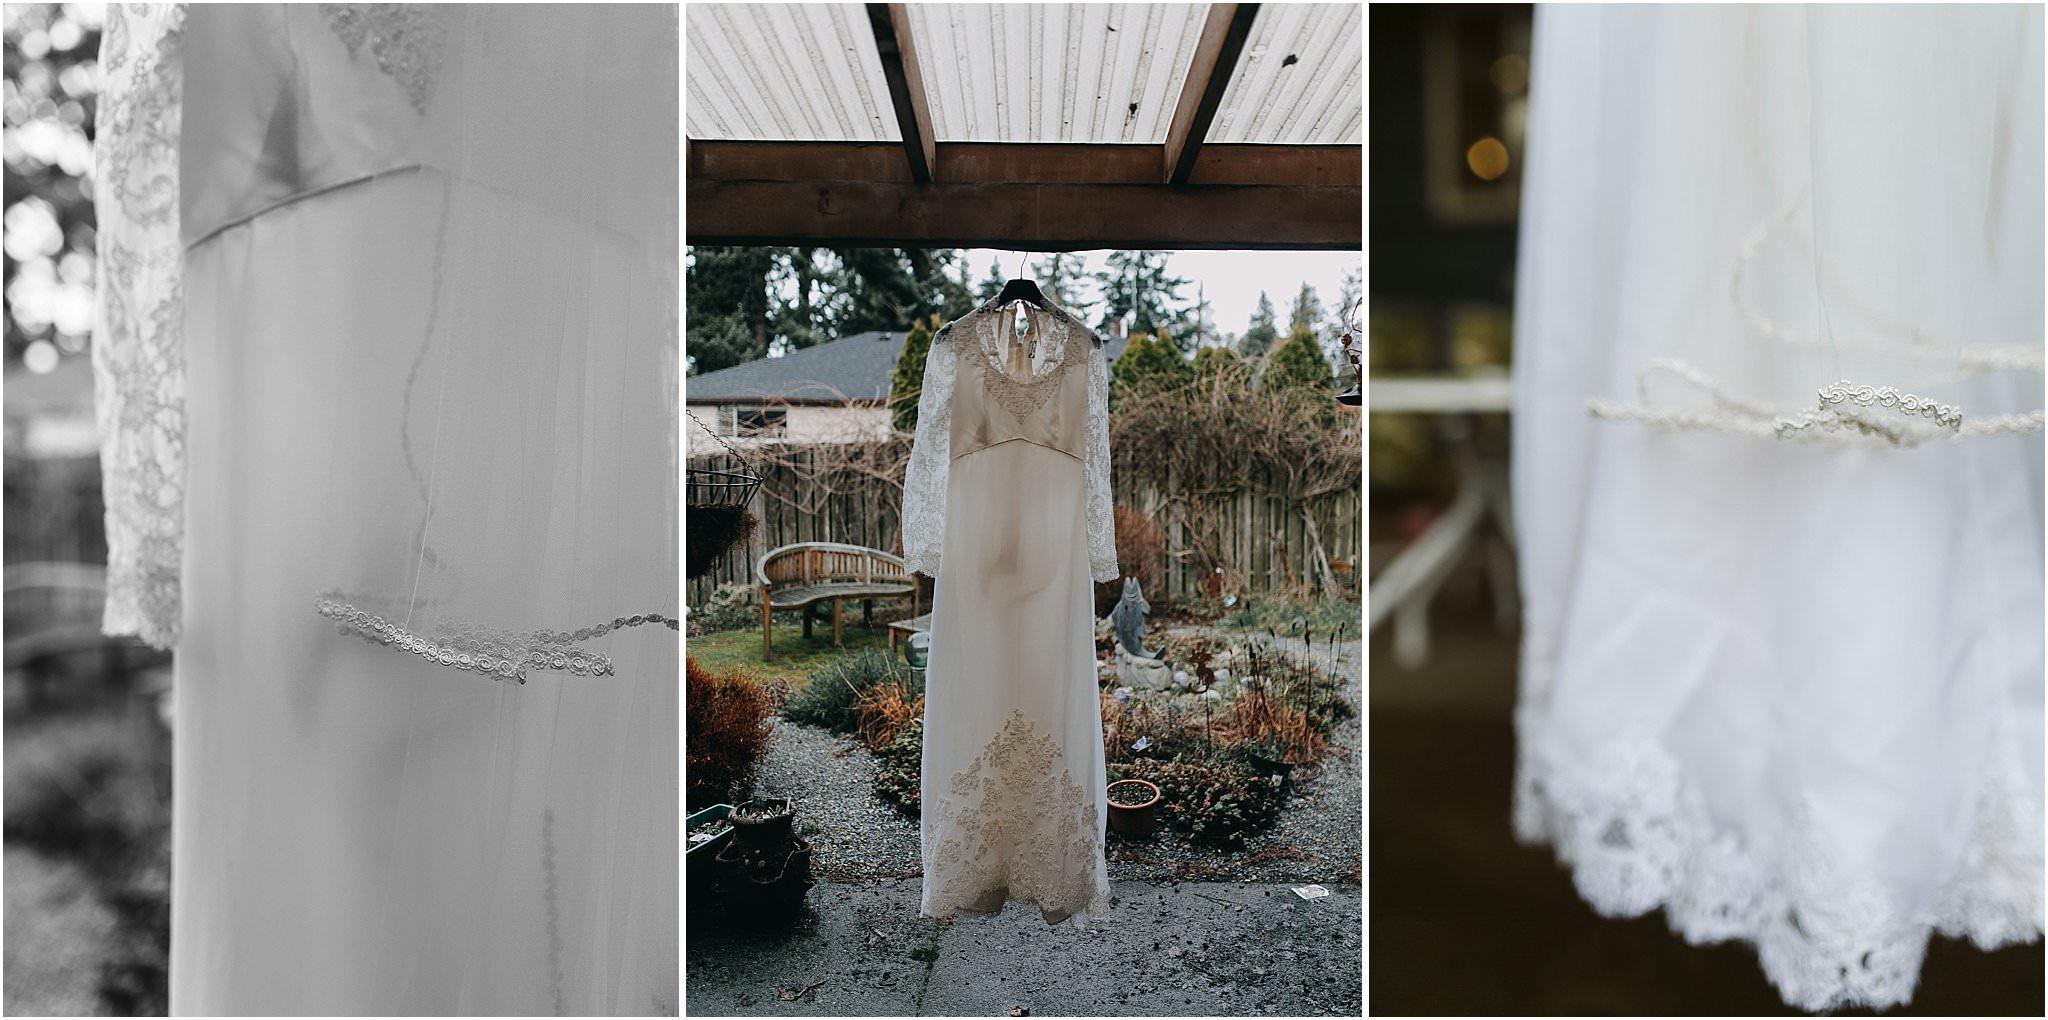 katy-robin-married-in-mukilteo-wedding7.jpg